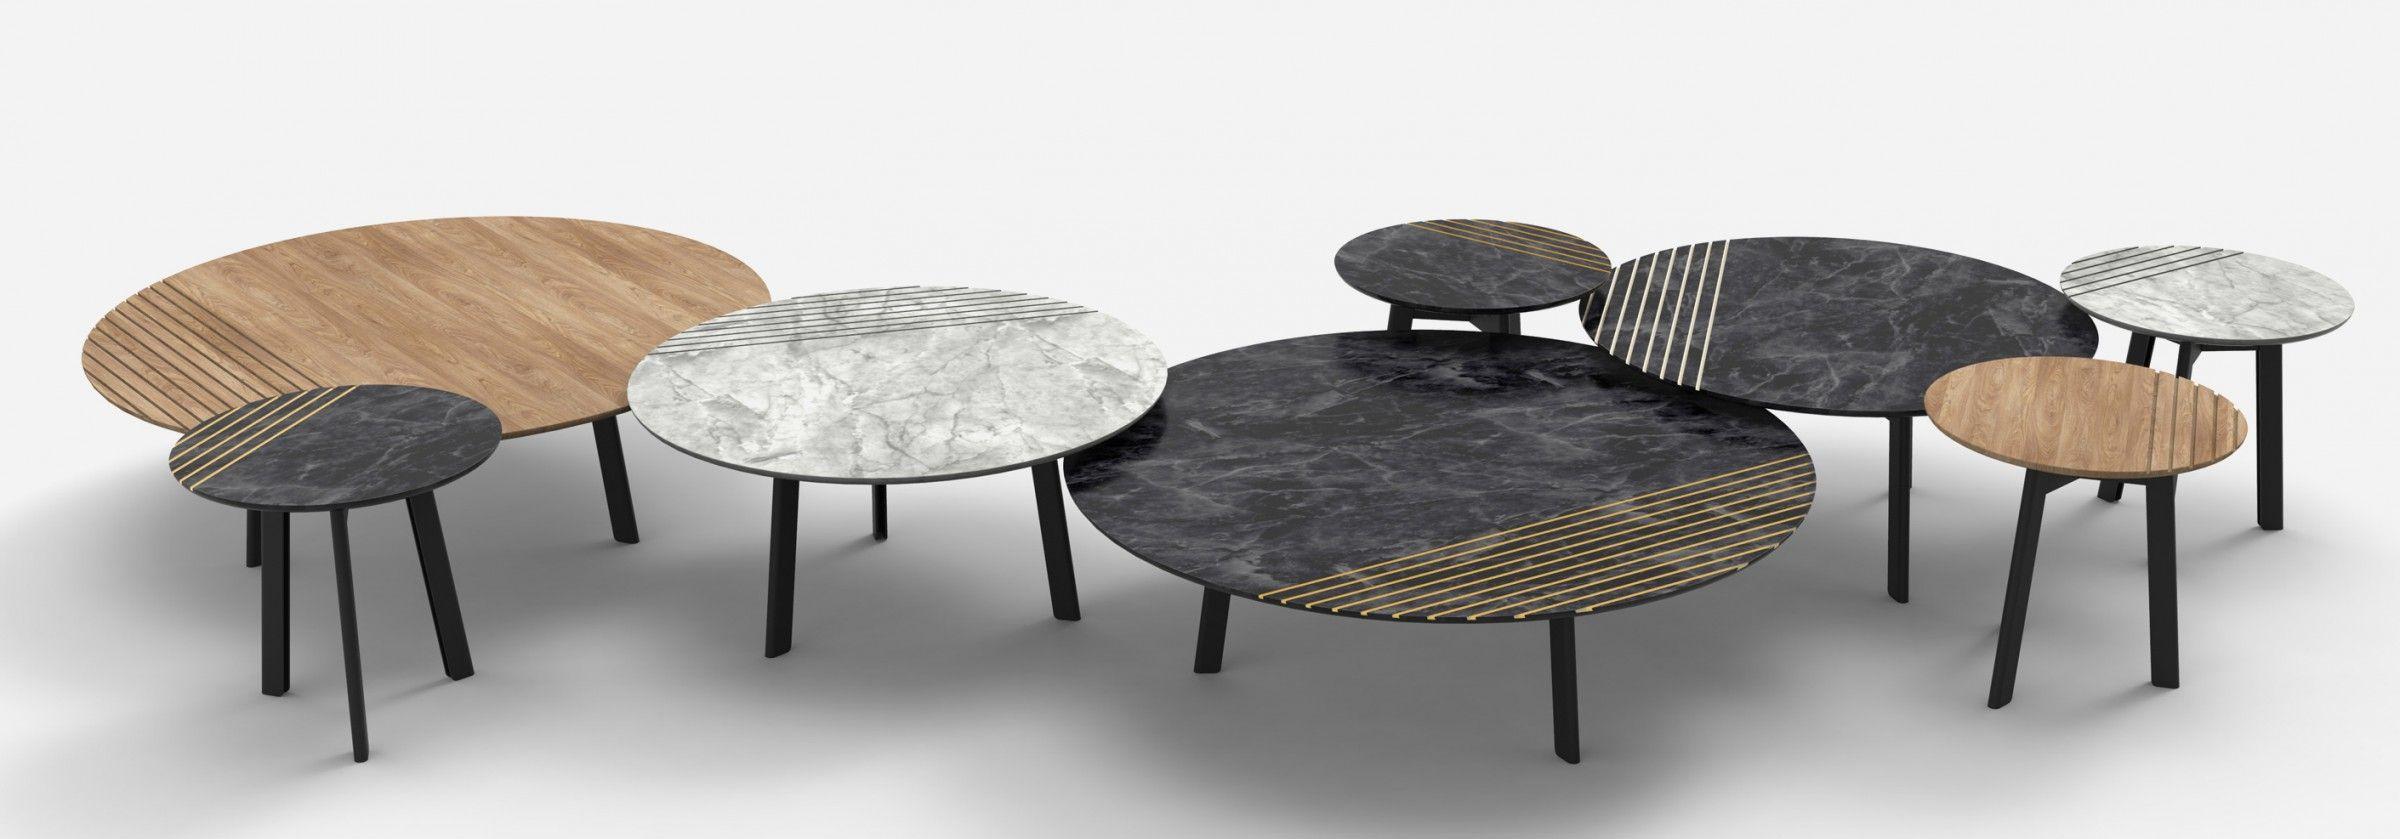 Pin by punyapat santanakul on furniture l mobilia l for Mobilia kitchen table